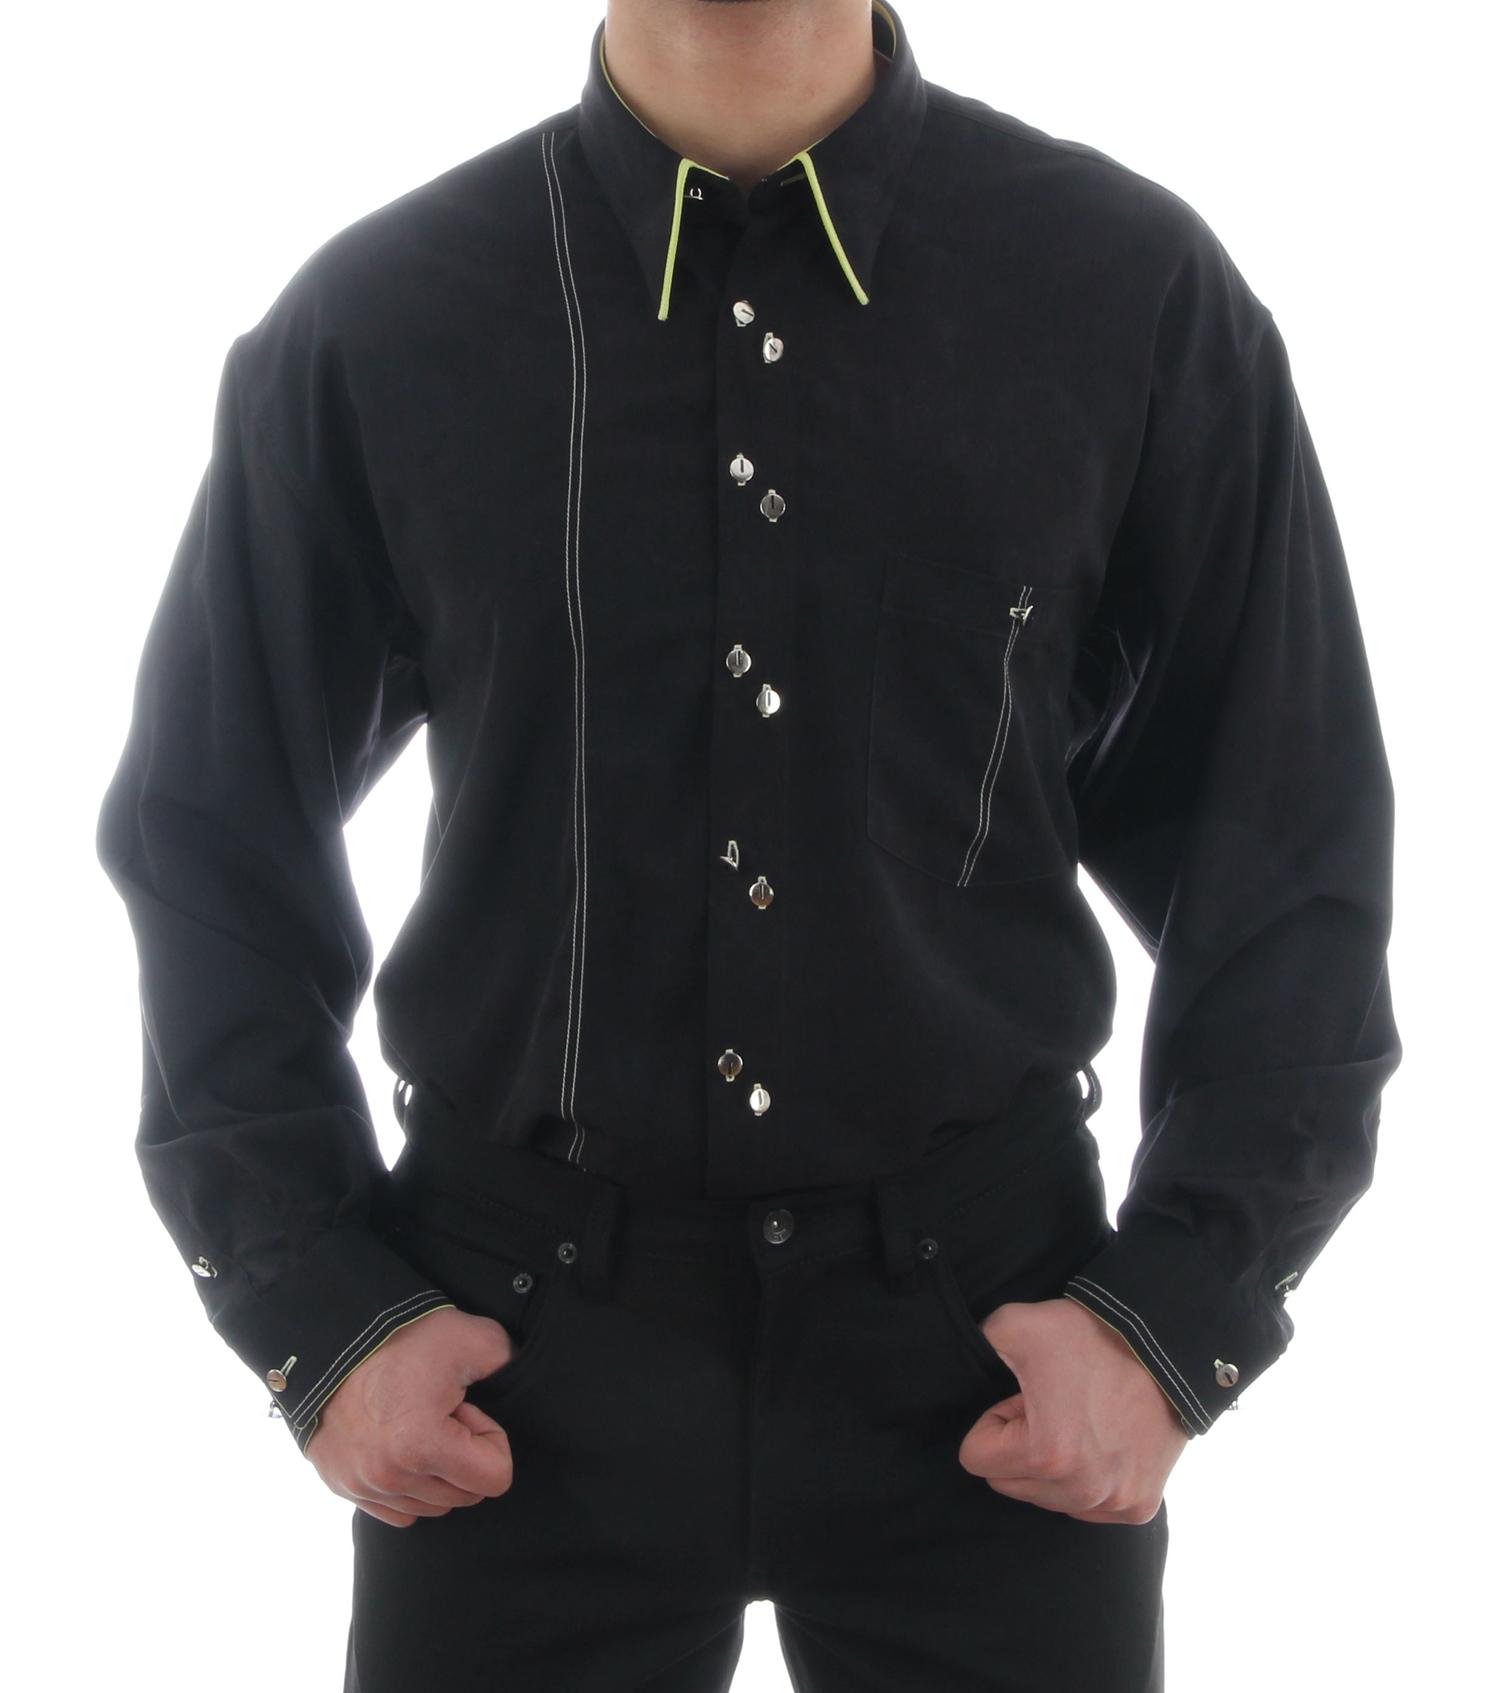 c259c582427c H.K. Mandel Kreative Mode für Männer - Original Bowling Hemd ...